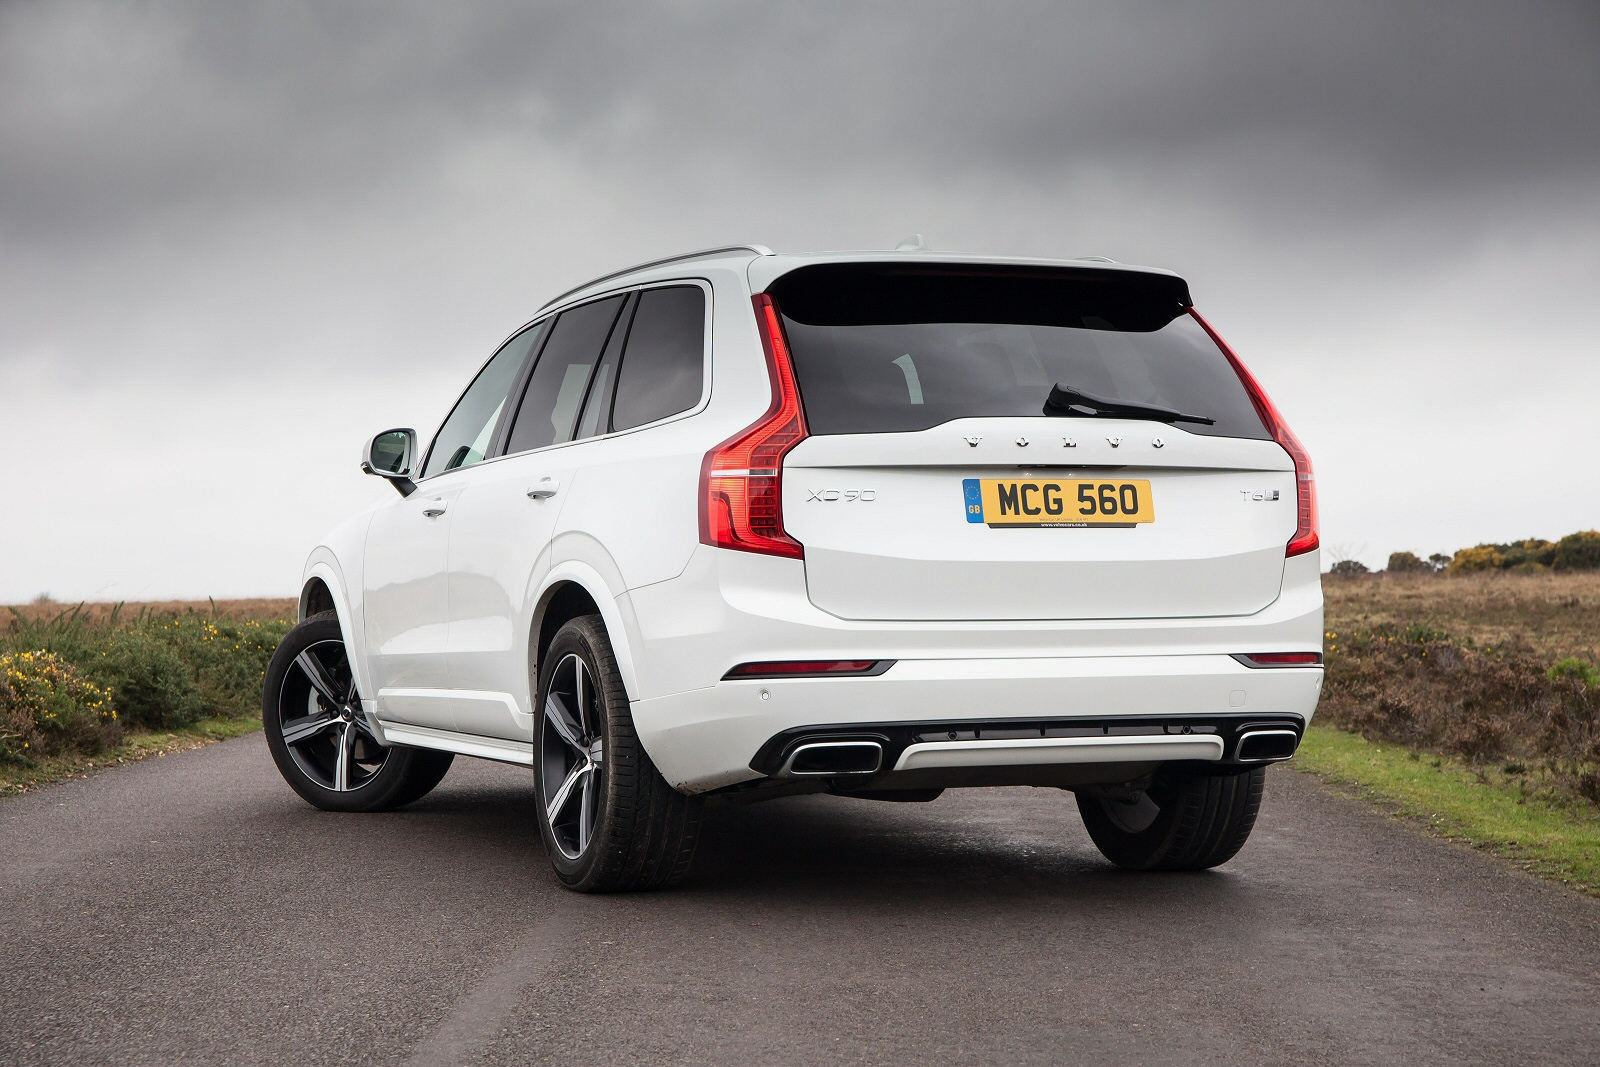 New Volvo Xc90 2.0 T5 [250] Momentum 5Dr Awd Gtron Petrol Estate for Sale | Bristol Street